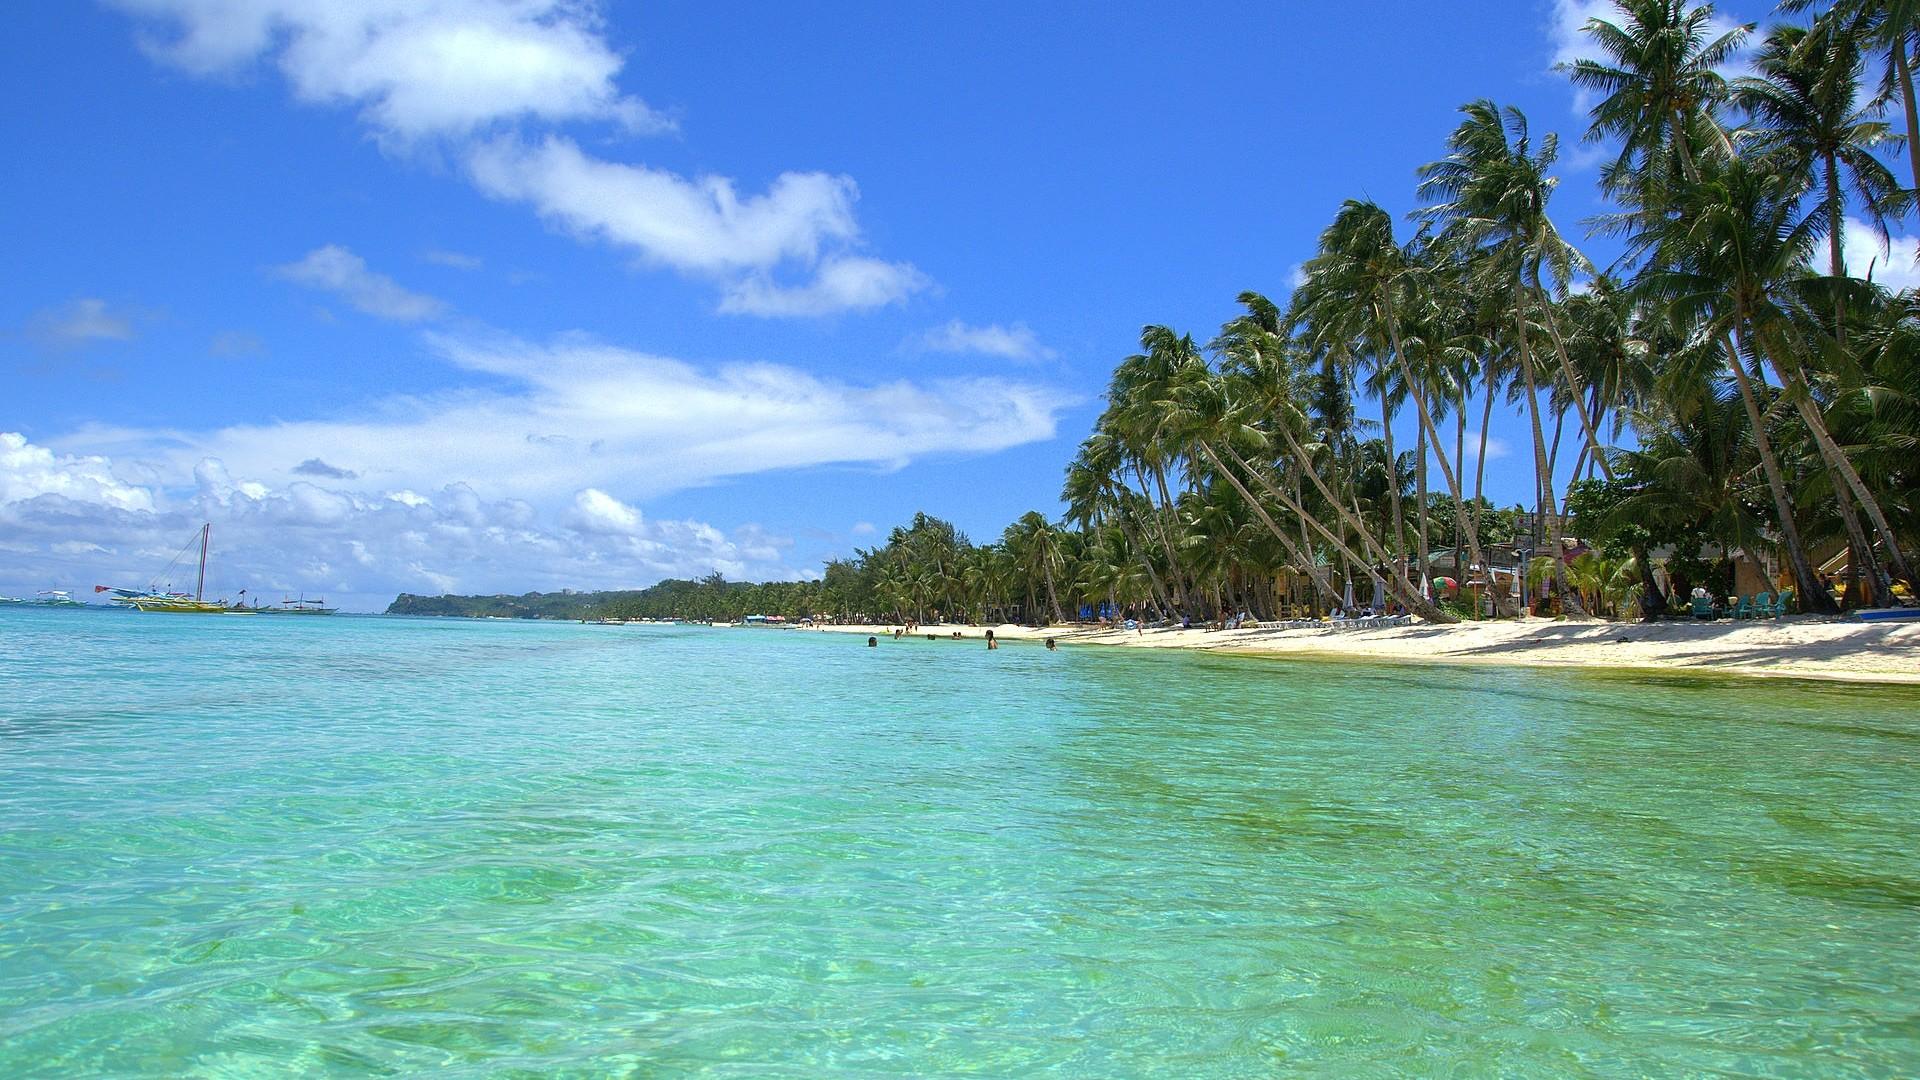 Hd Tropical Island Beach Paradise Wallpapers And Backgrounds: Tropical Beach Wallpaper Desktop ·① WallpaperTag